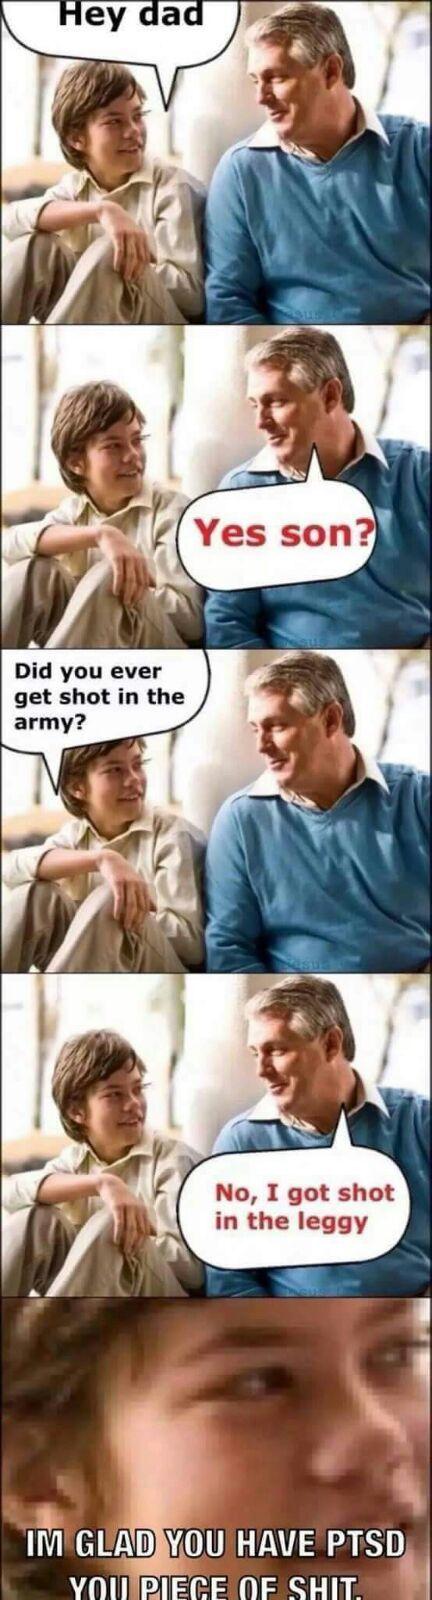 Just dad jokes - meme